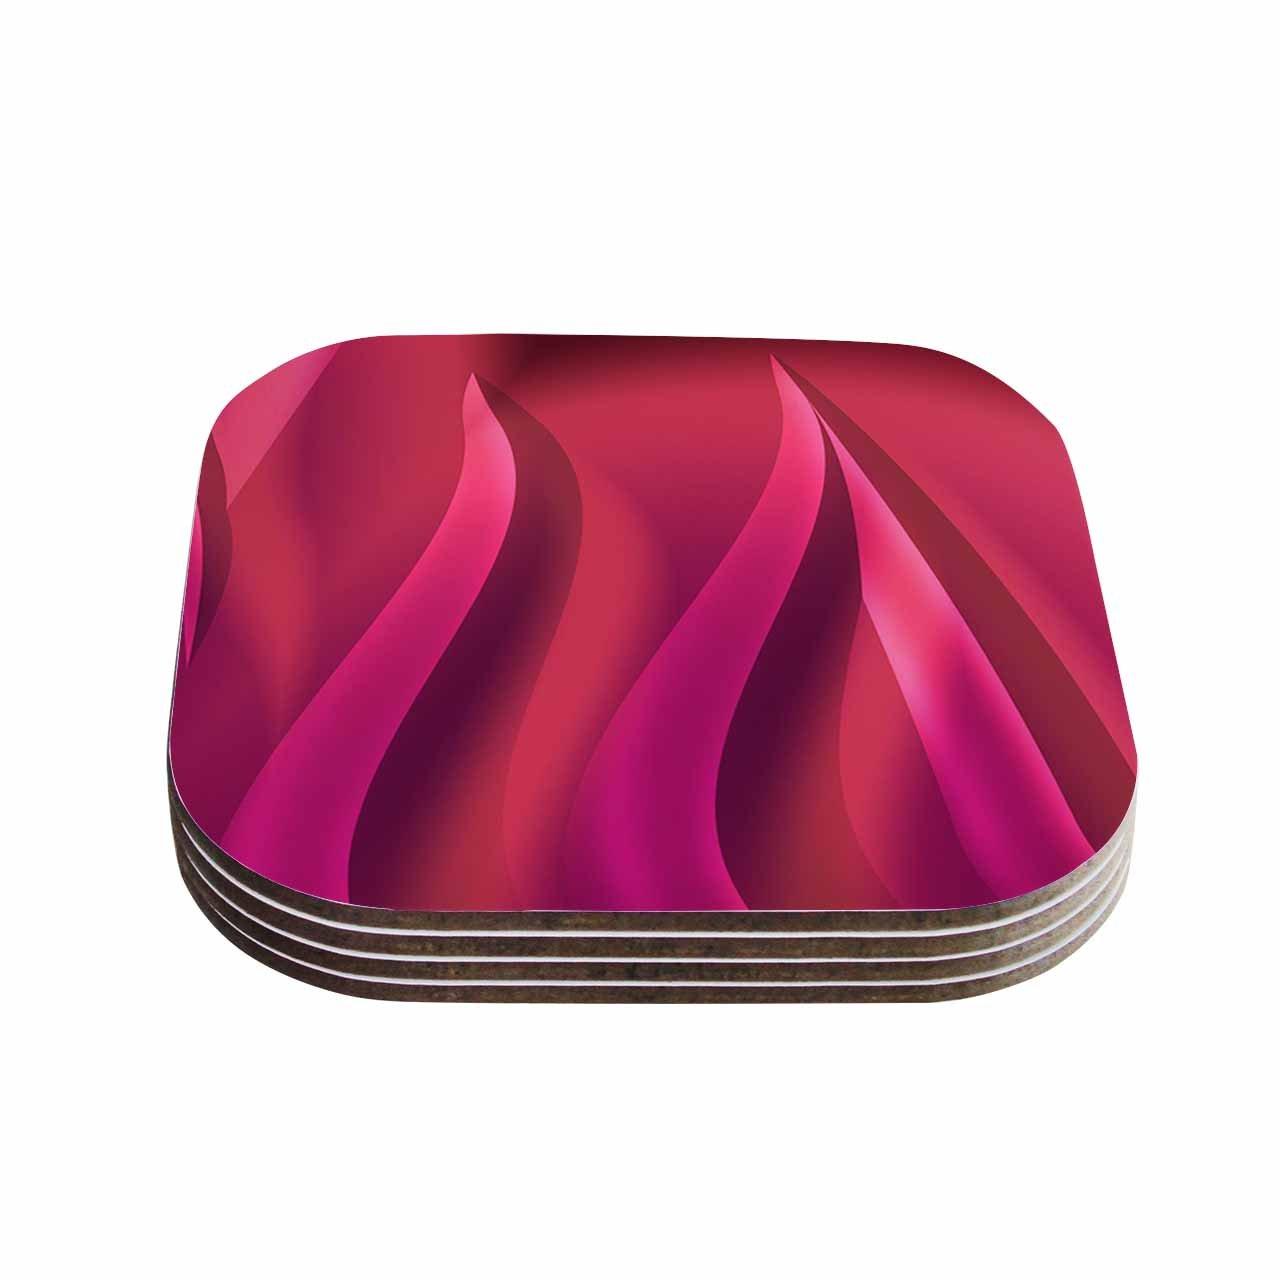 4 x 4 KESS InHouse Fotios PavlopoulosPetals in Pink Magenta Coasters Multicolor Set of 4